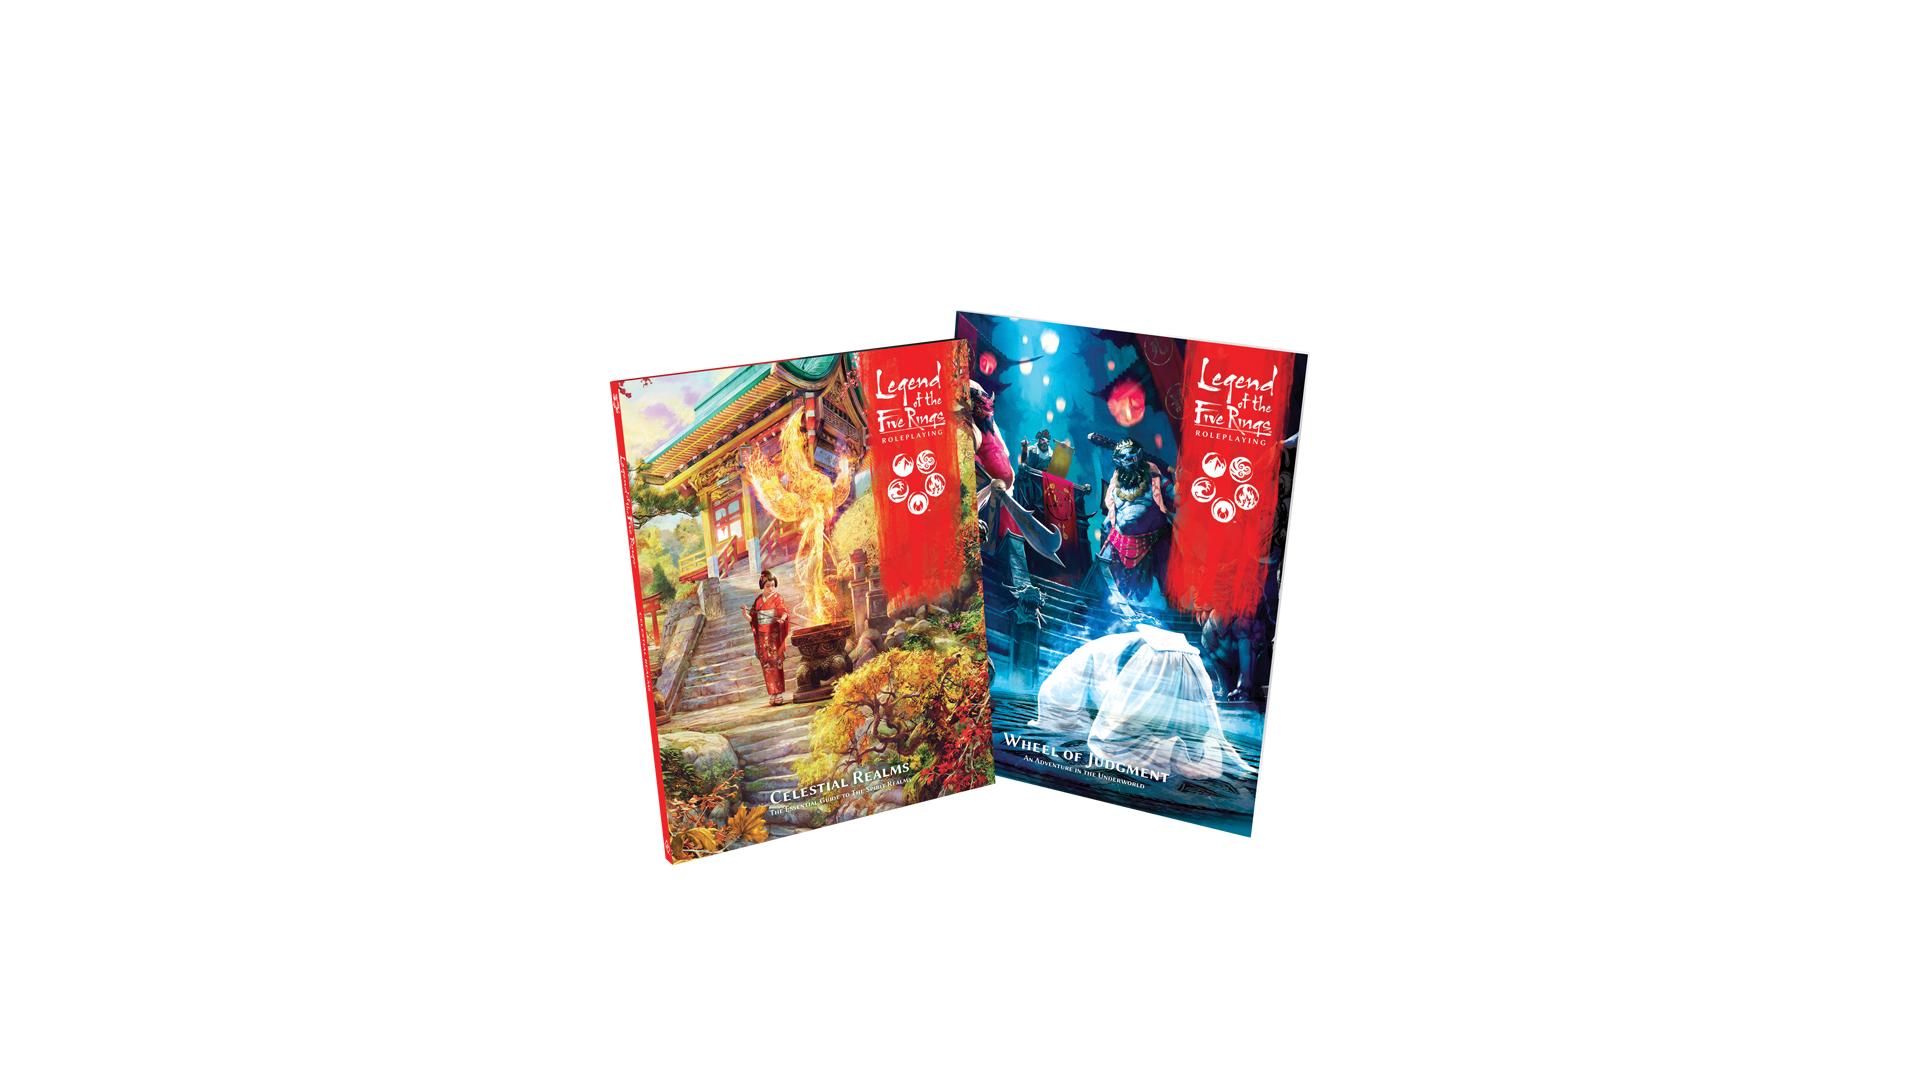 LegendoftheFiveRings_RpgAdevnture_Books.png